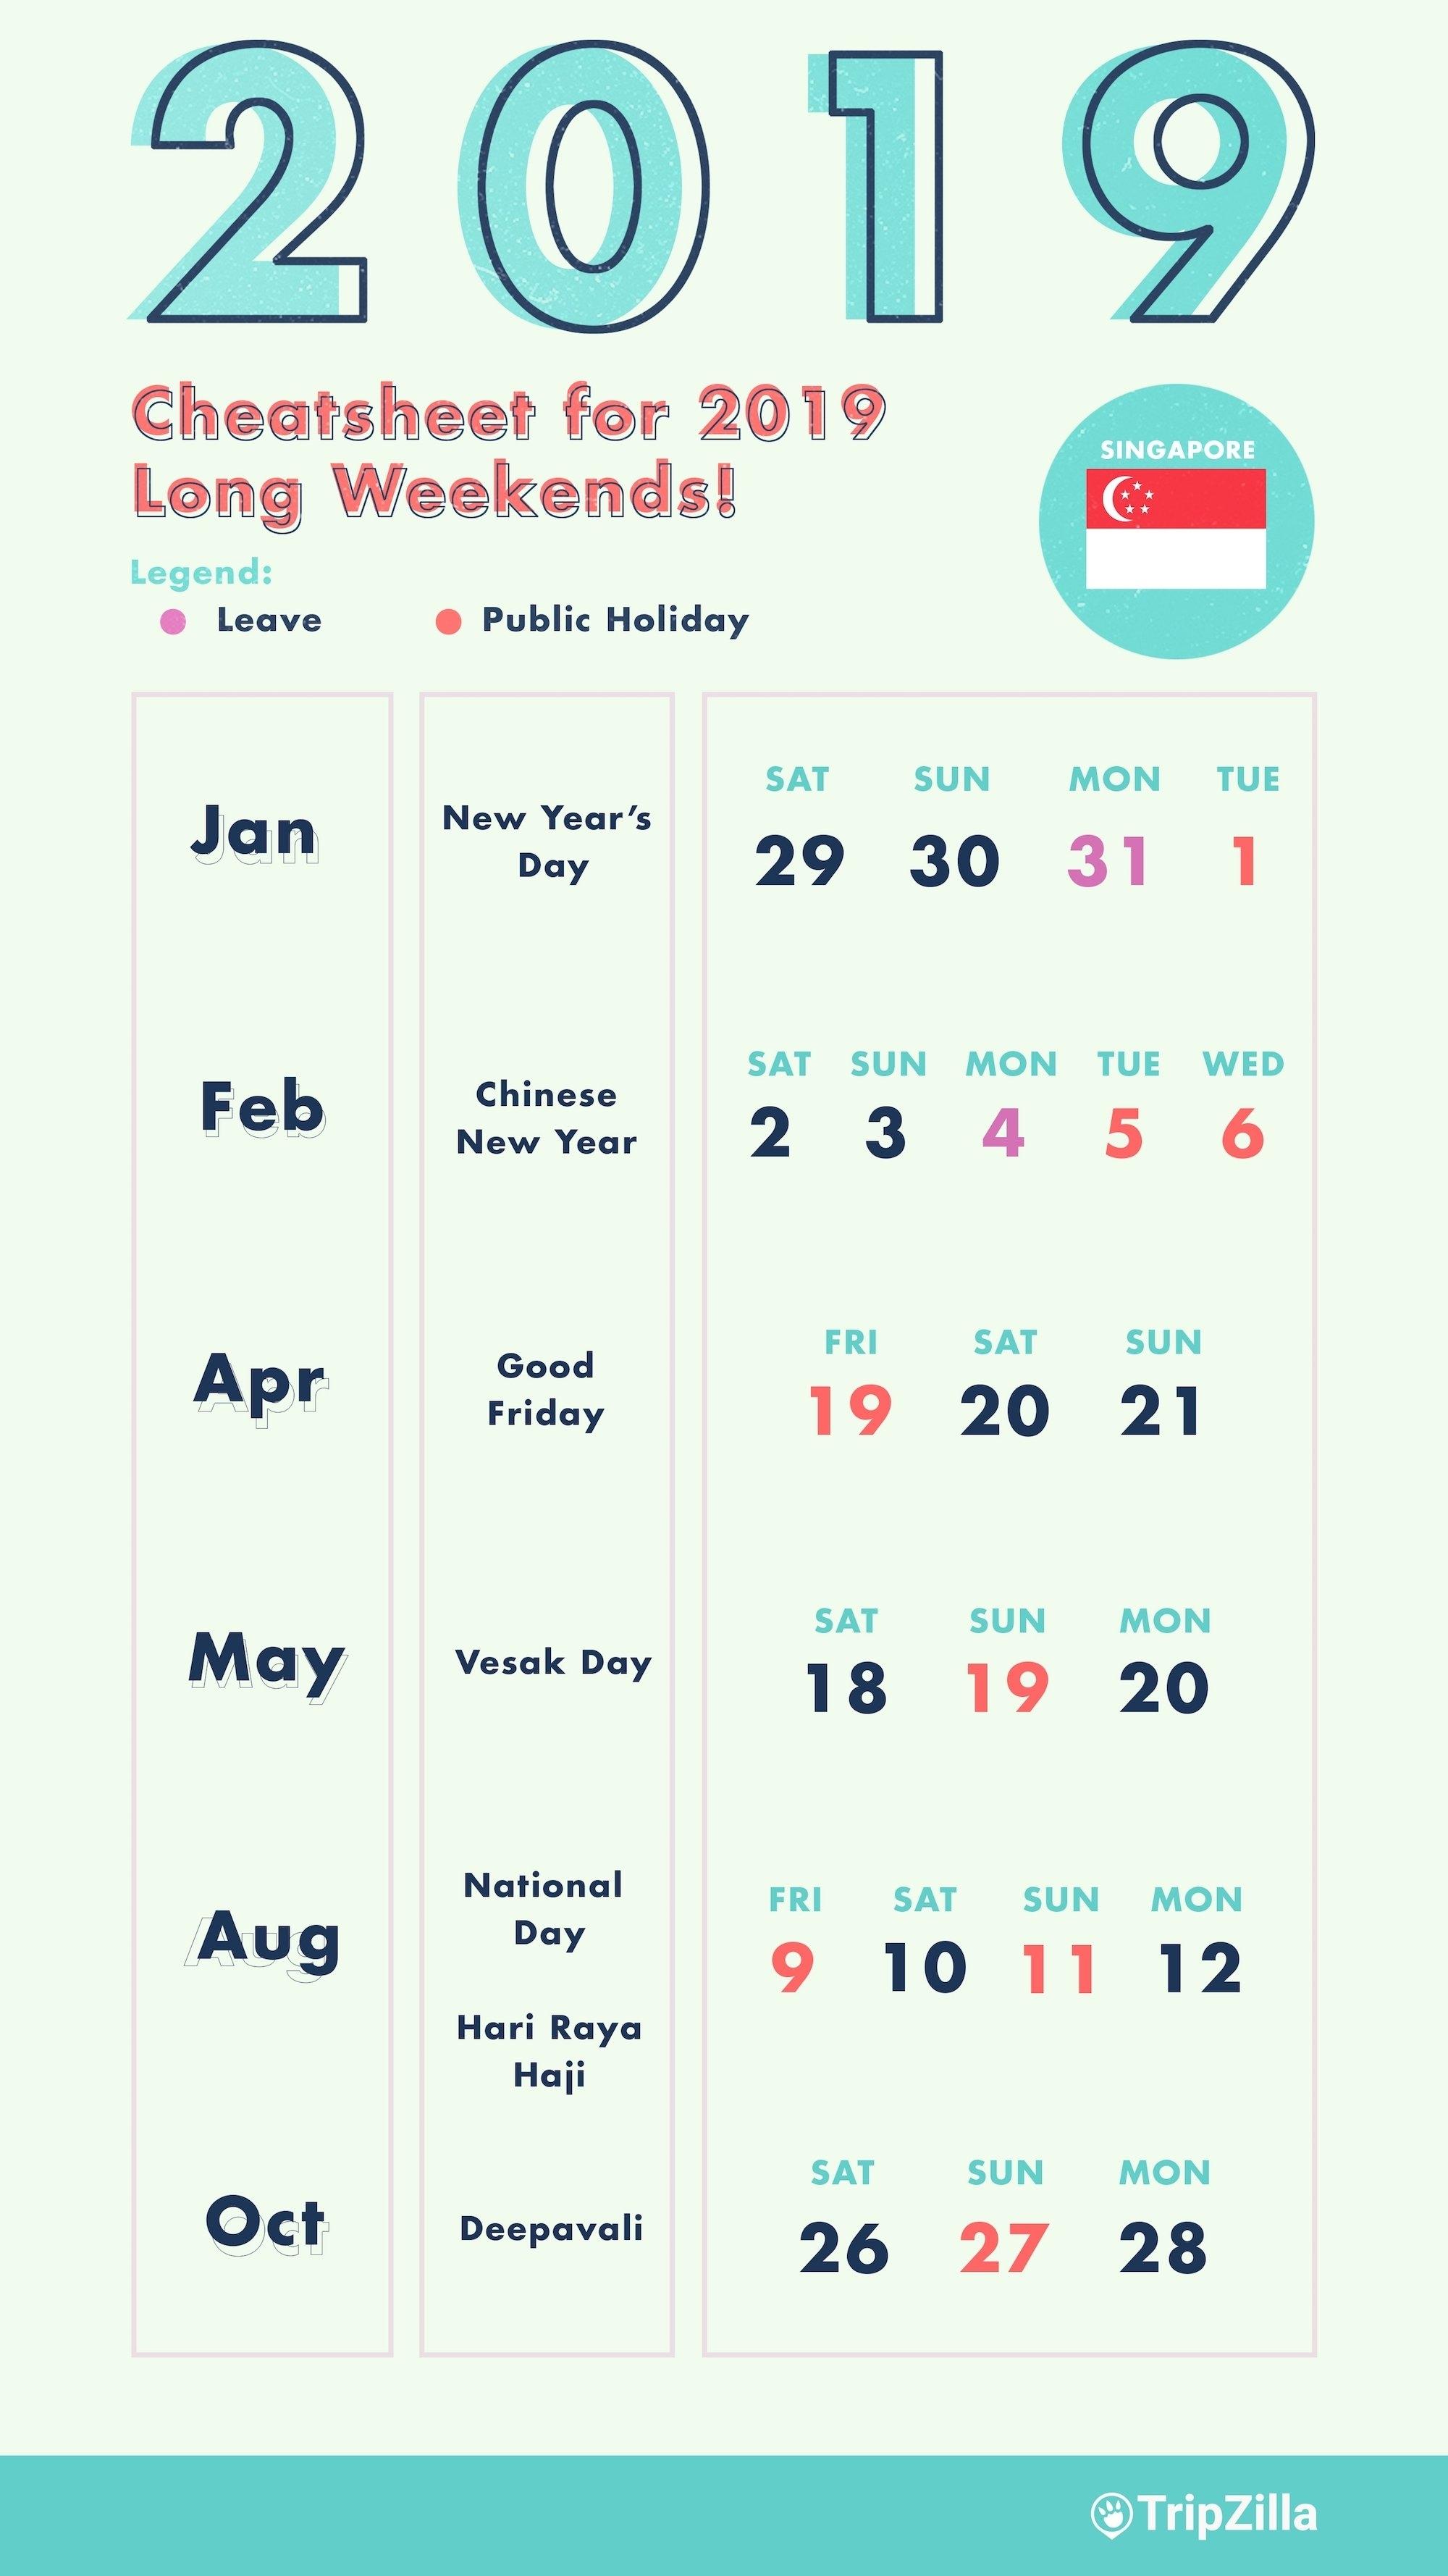 June 2019 Cruise Calendar | Template Calendar Printable Calendar 2019 Long Weekend